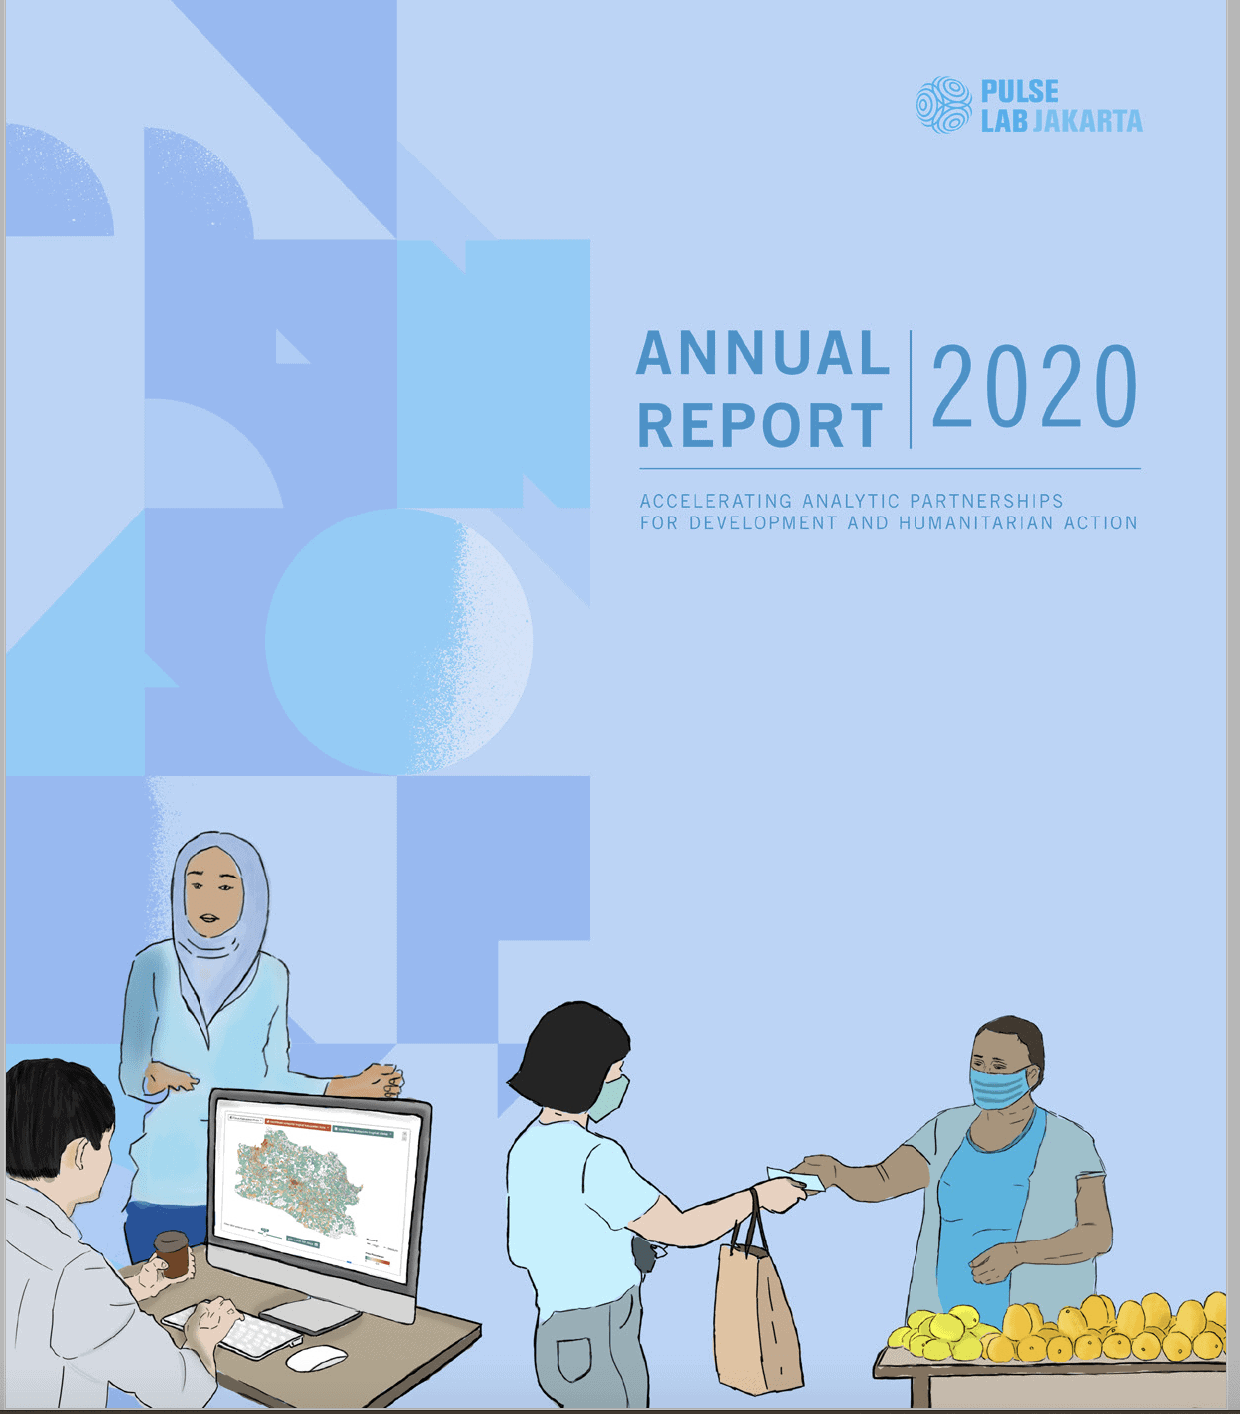 Pulse Lab Jakarta Annual Report 2020 130